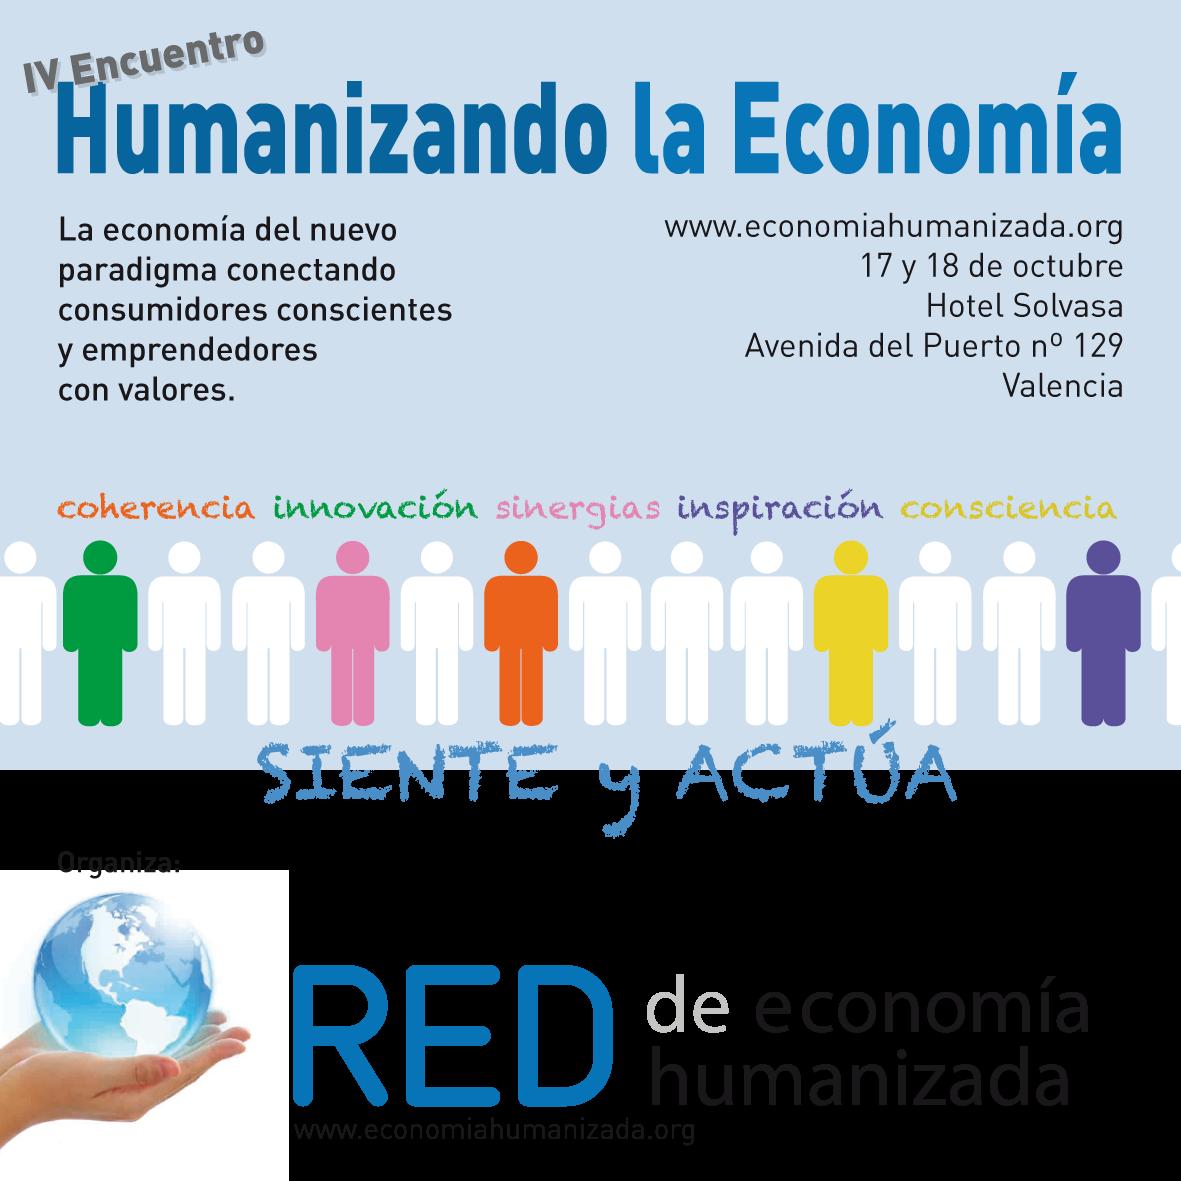 IV Encuentro de Humanizando la Economia